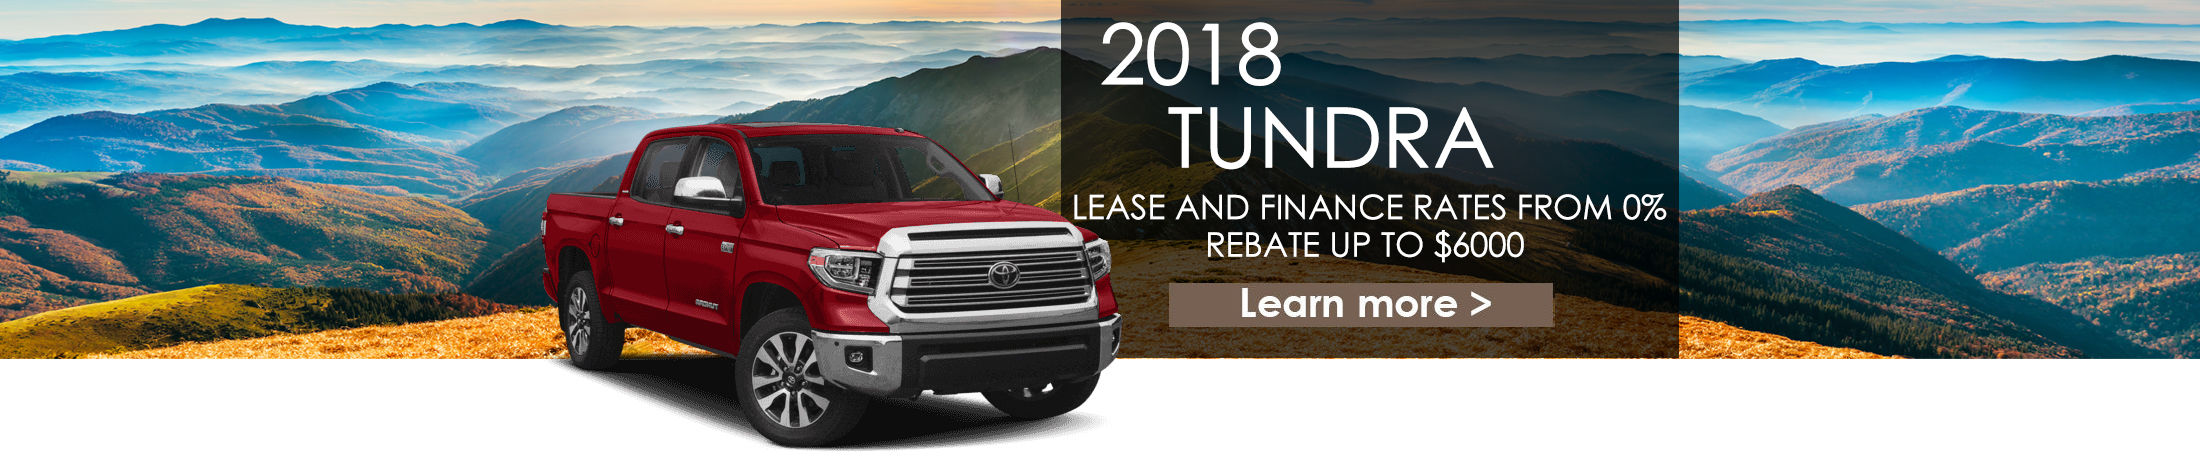 2018 Tundra Banner